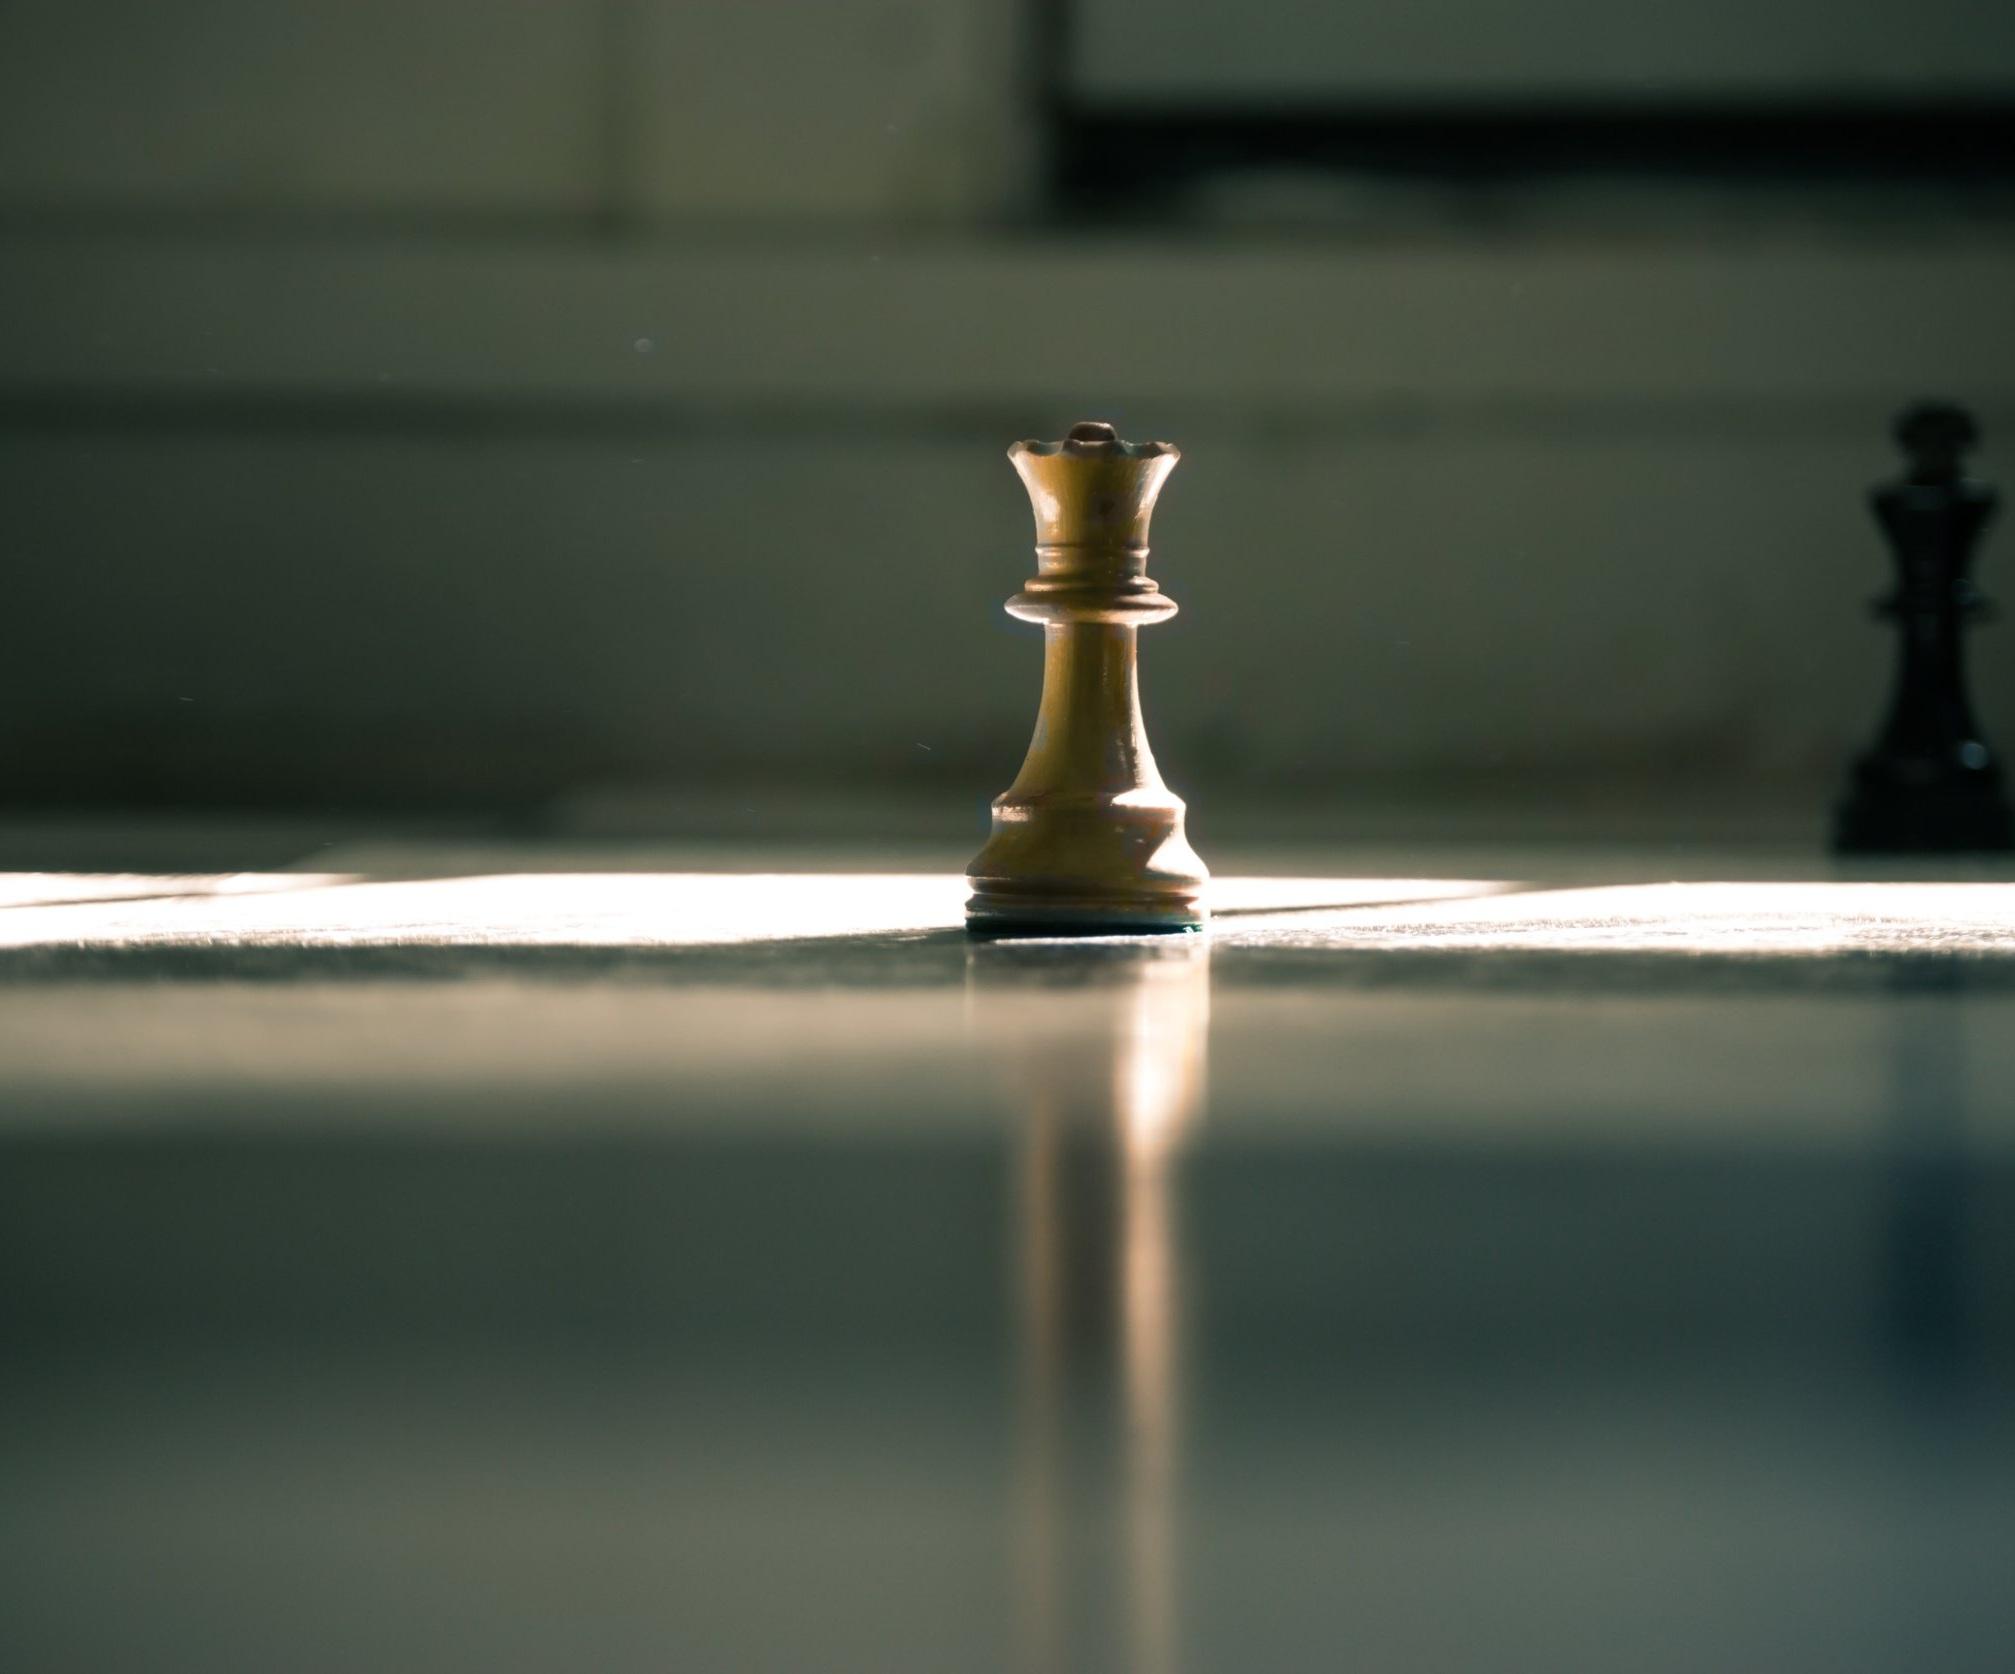 blur-board-game-chess-851117.jpg